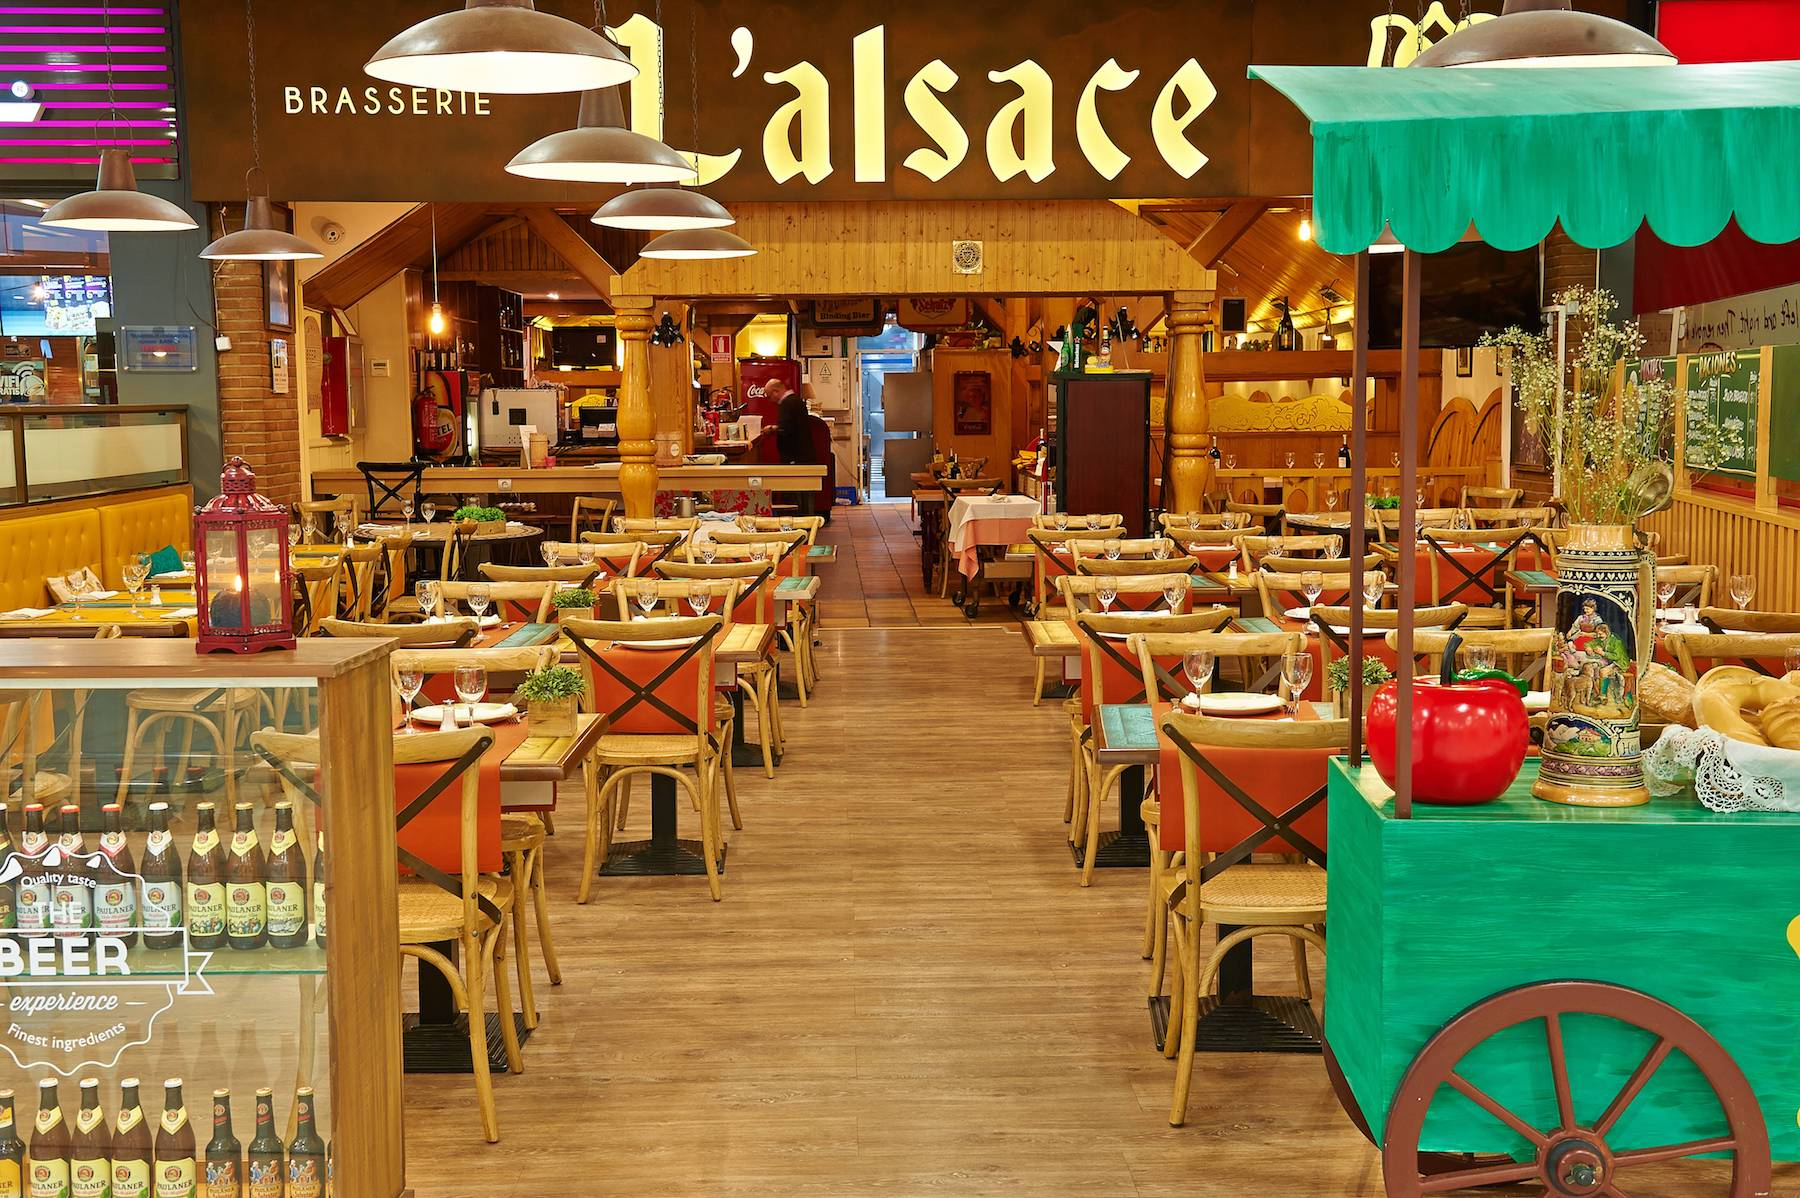 L'alsace-restaurante